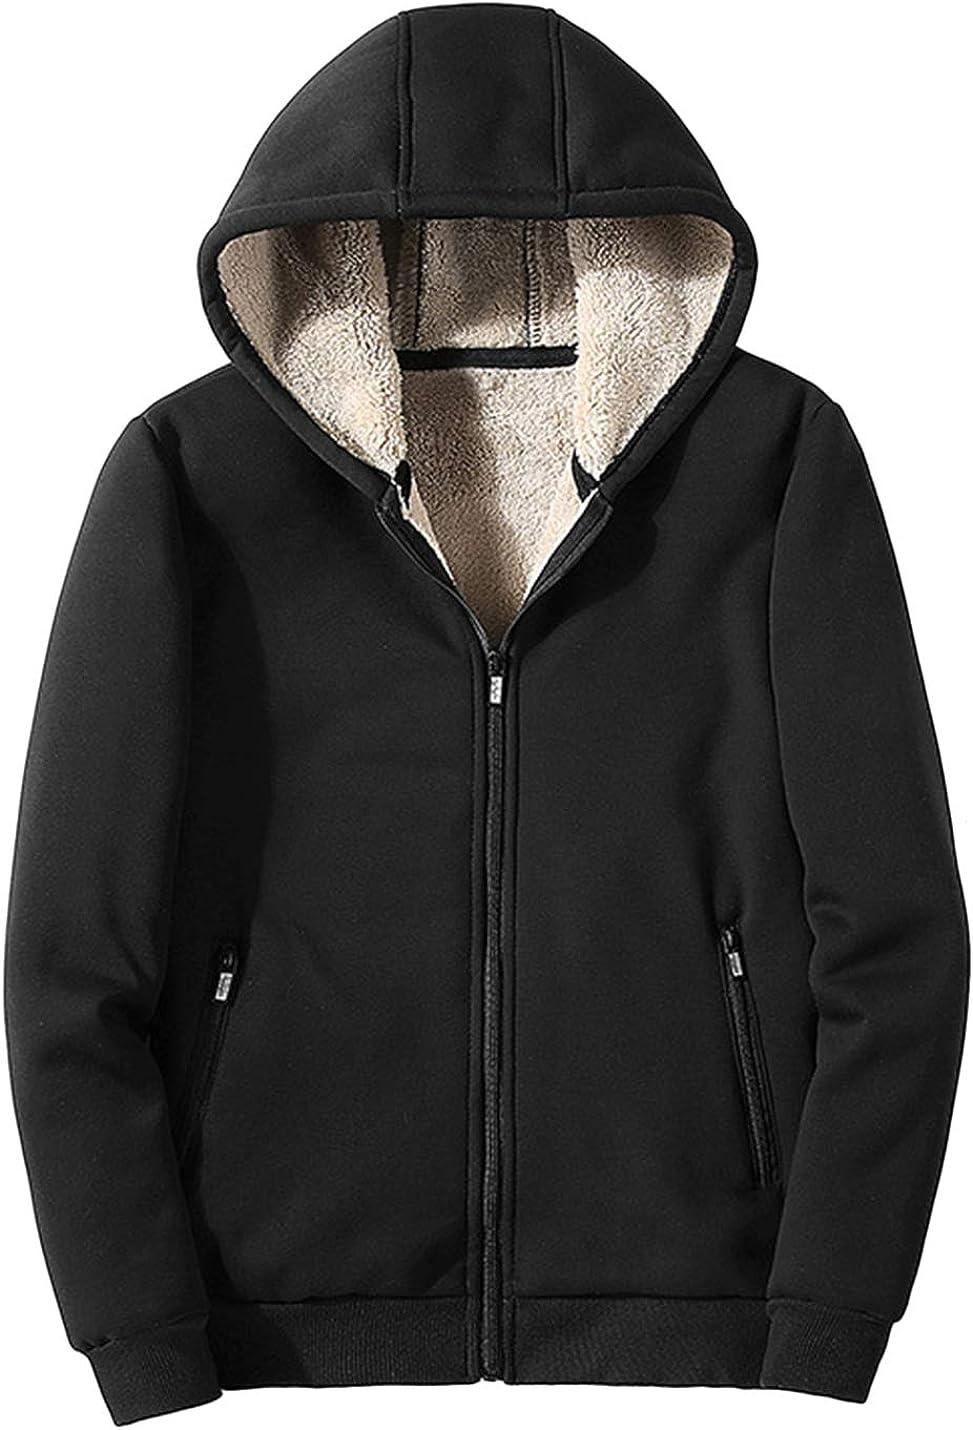 HaoMay Men's Winter Full-Zip Sherpa Fleece Lined Hooded Sweatshirts Jacket